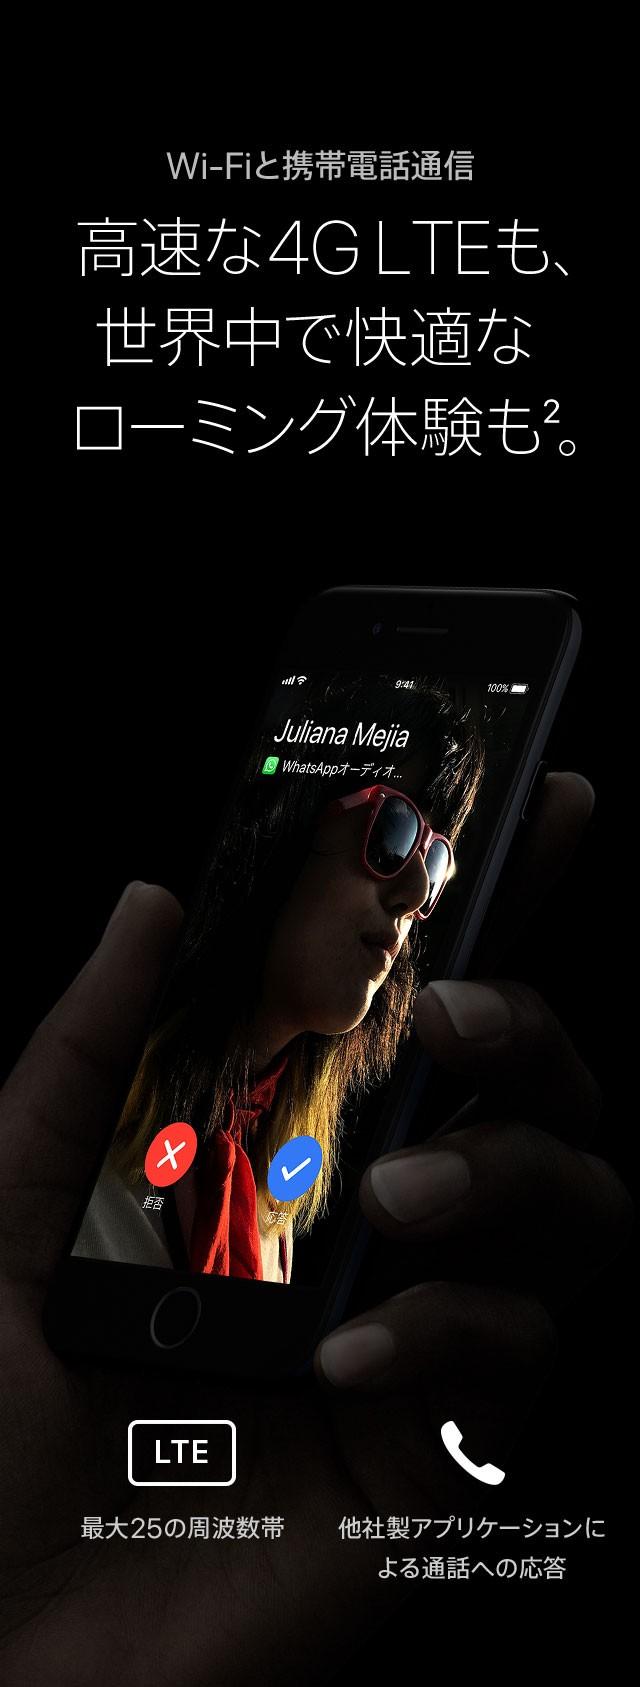 Wi-Fiと携帯電話通信  高速な4G LTEも、世界中で快適なローミング体験も2。